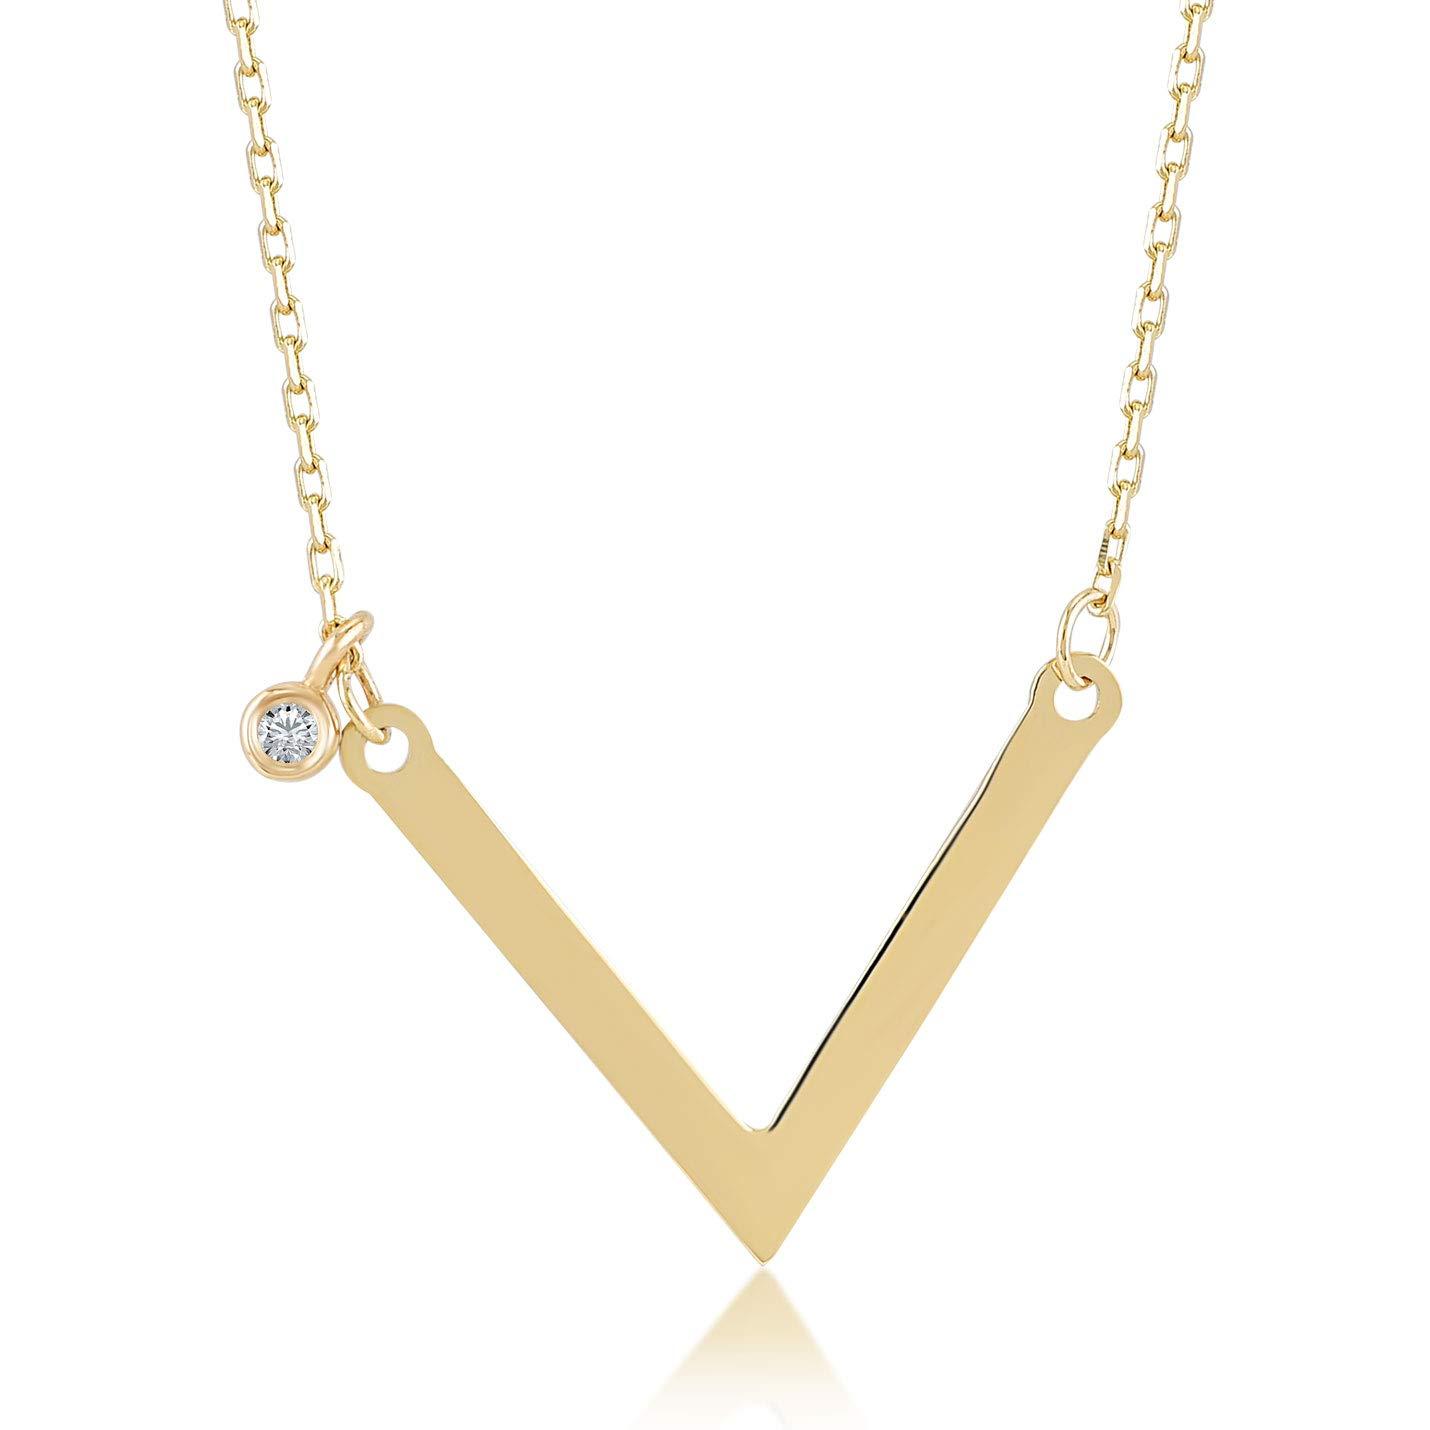 Gelin 14kゴールド0,01カラットダイヤモンドVペンダントネックレスレディーススタイル - 認定ファインジュエリー誕生日プレゼント - 41.91 cm